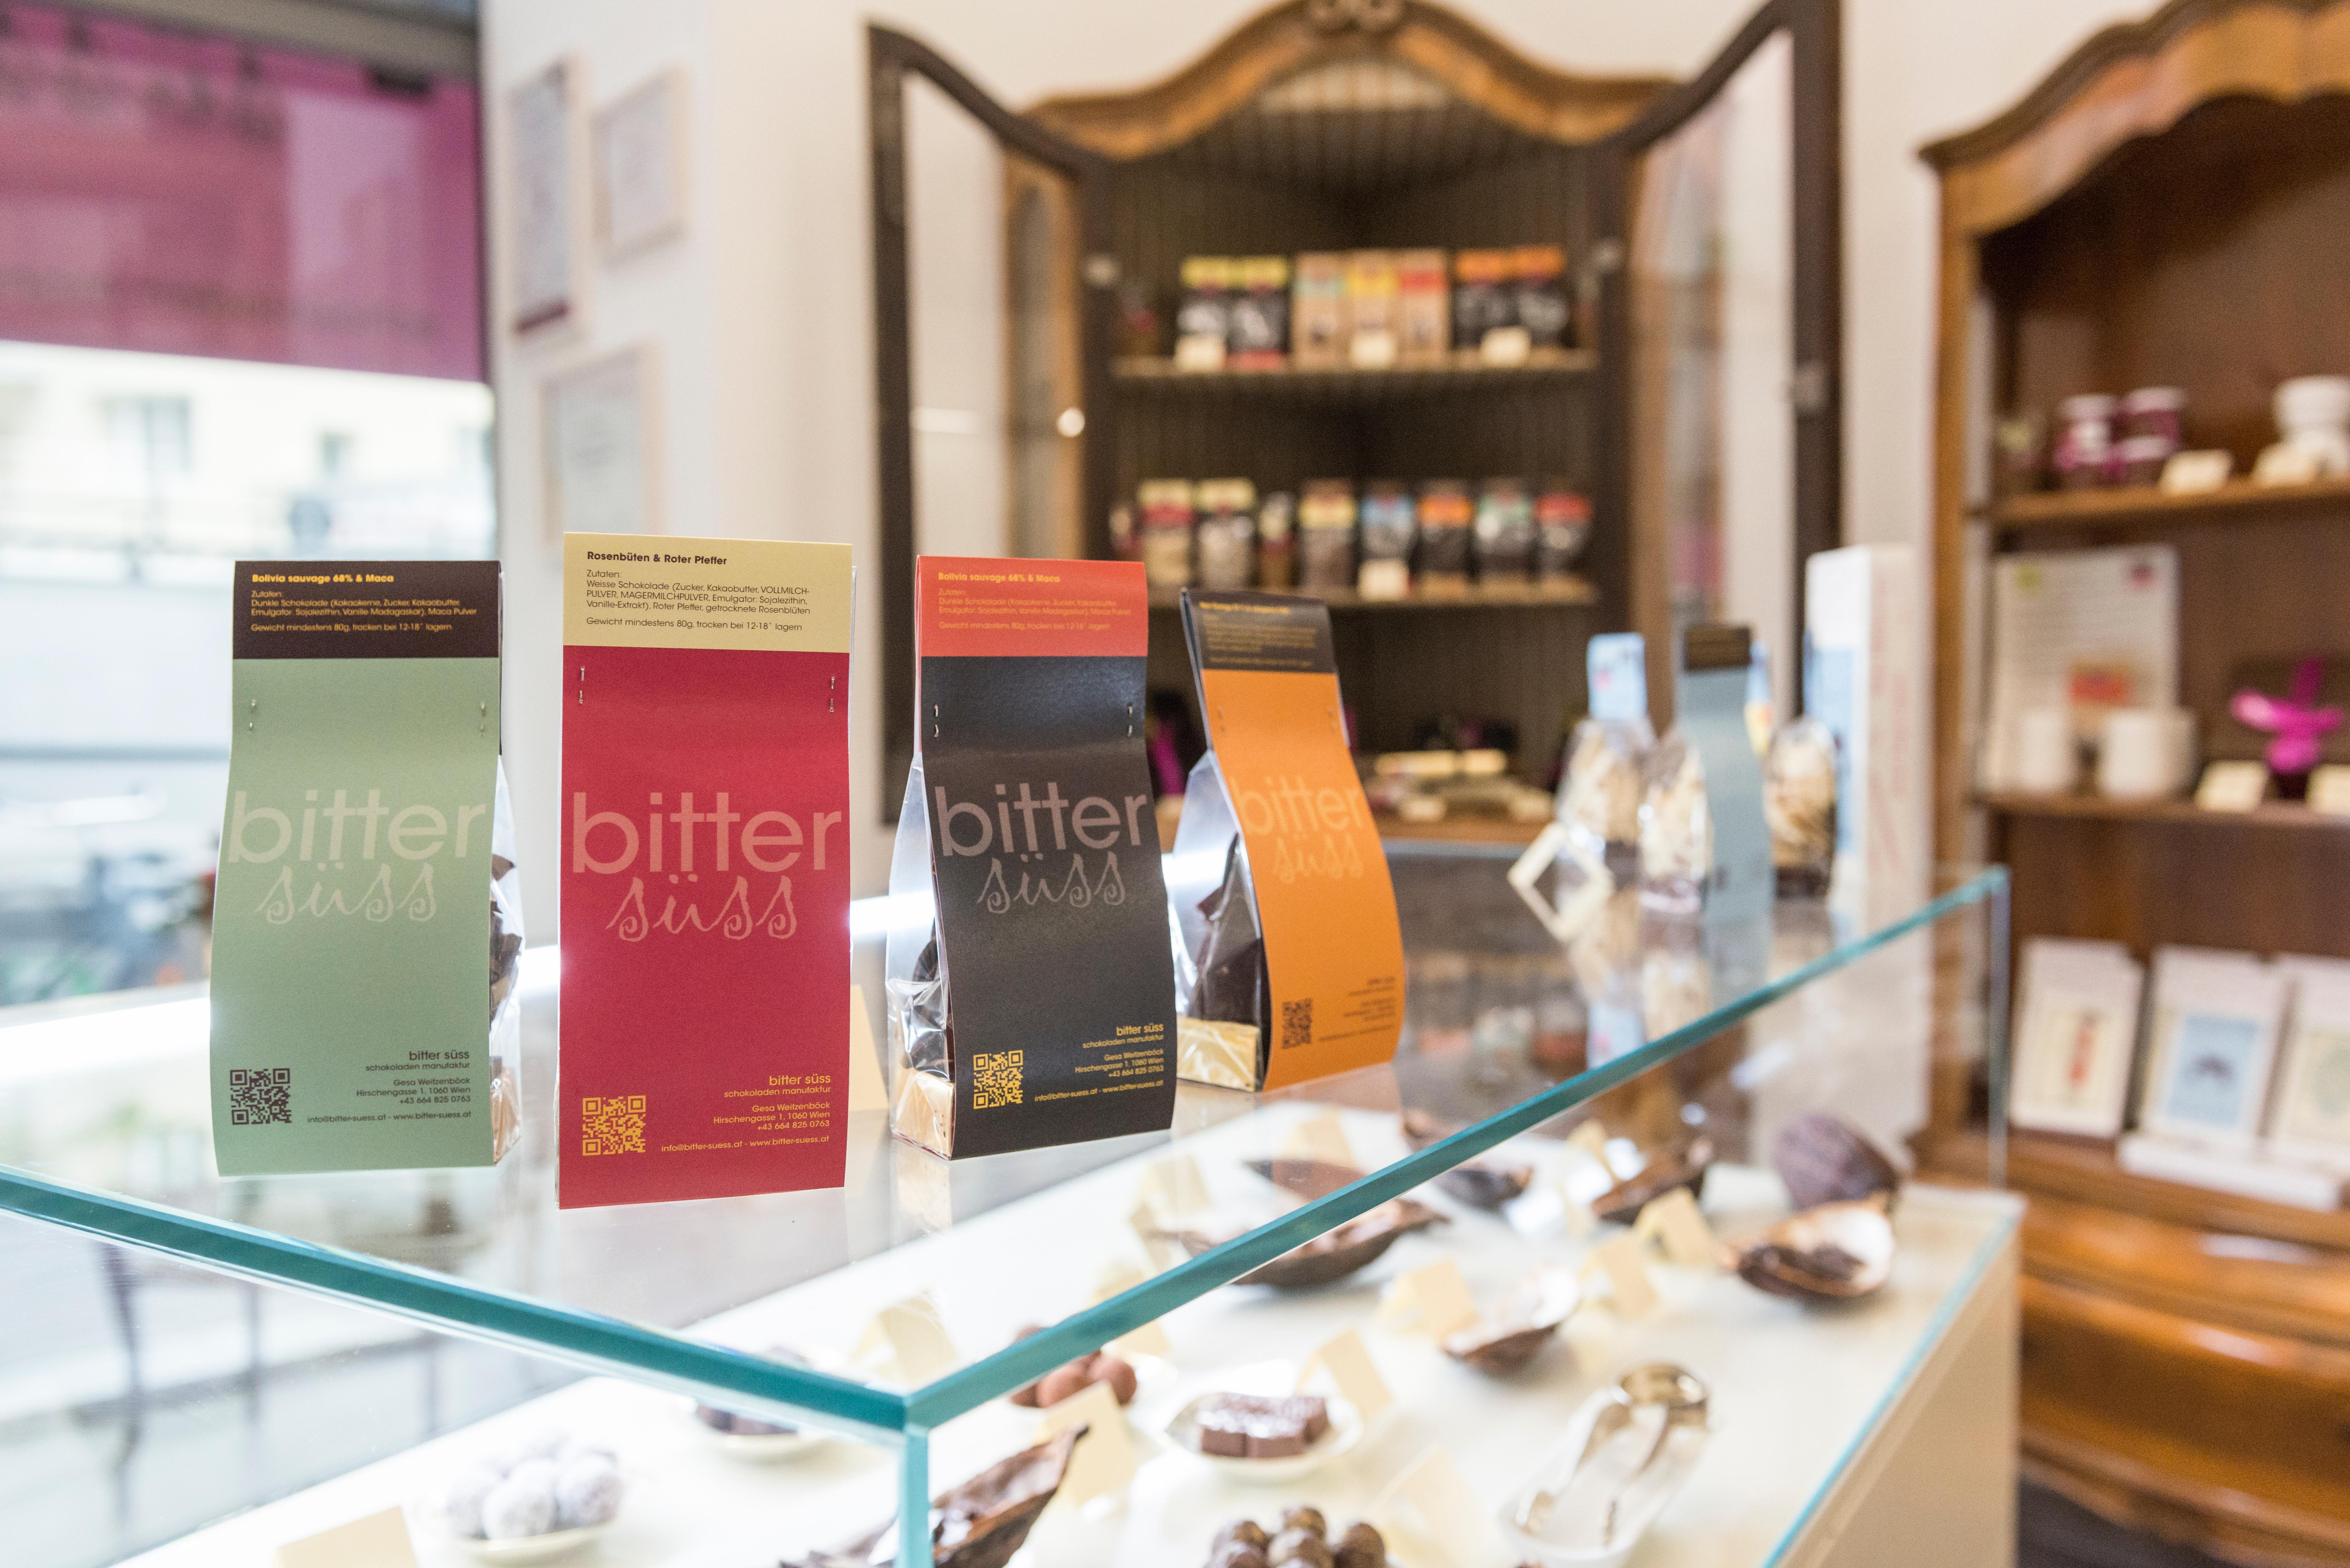 bitter süss - schokoladen manufaktur